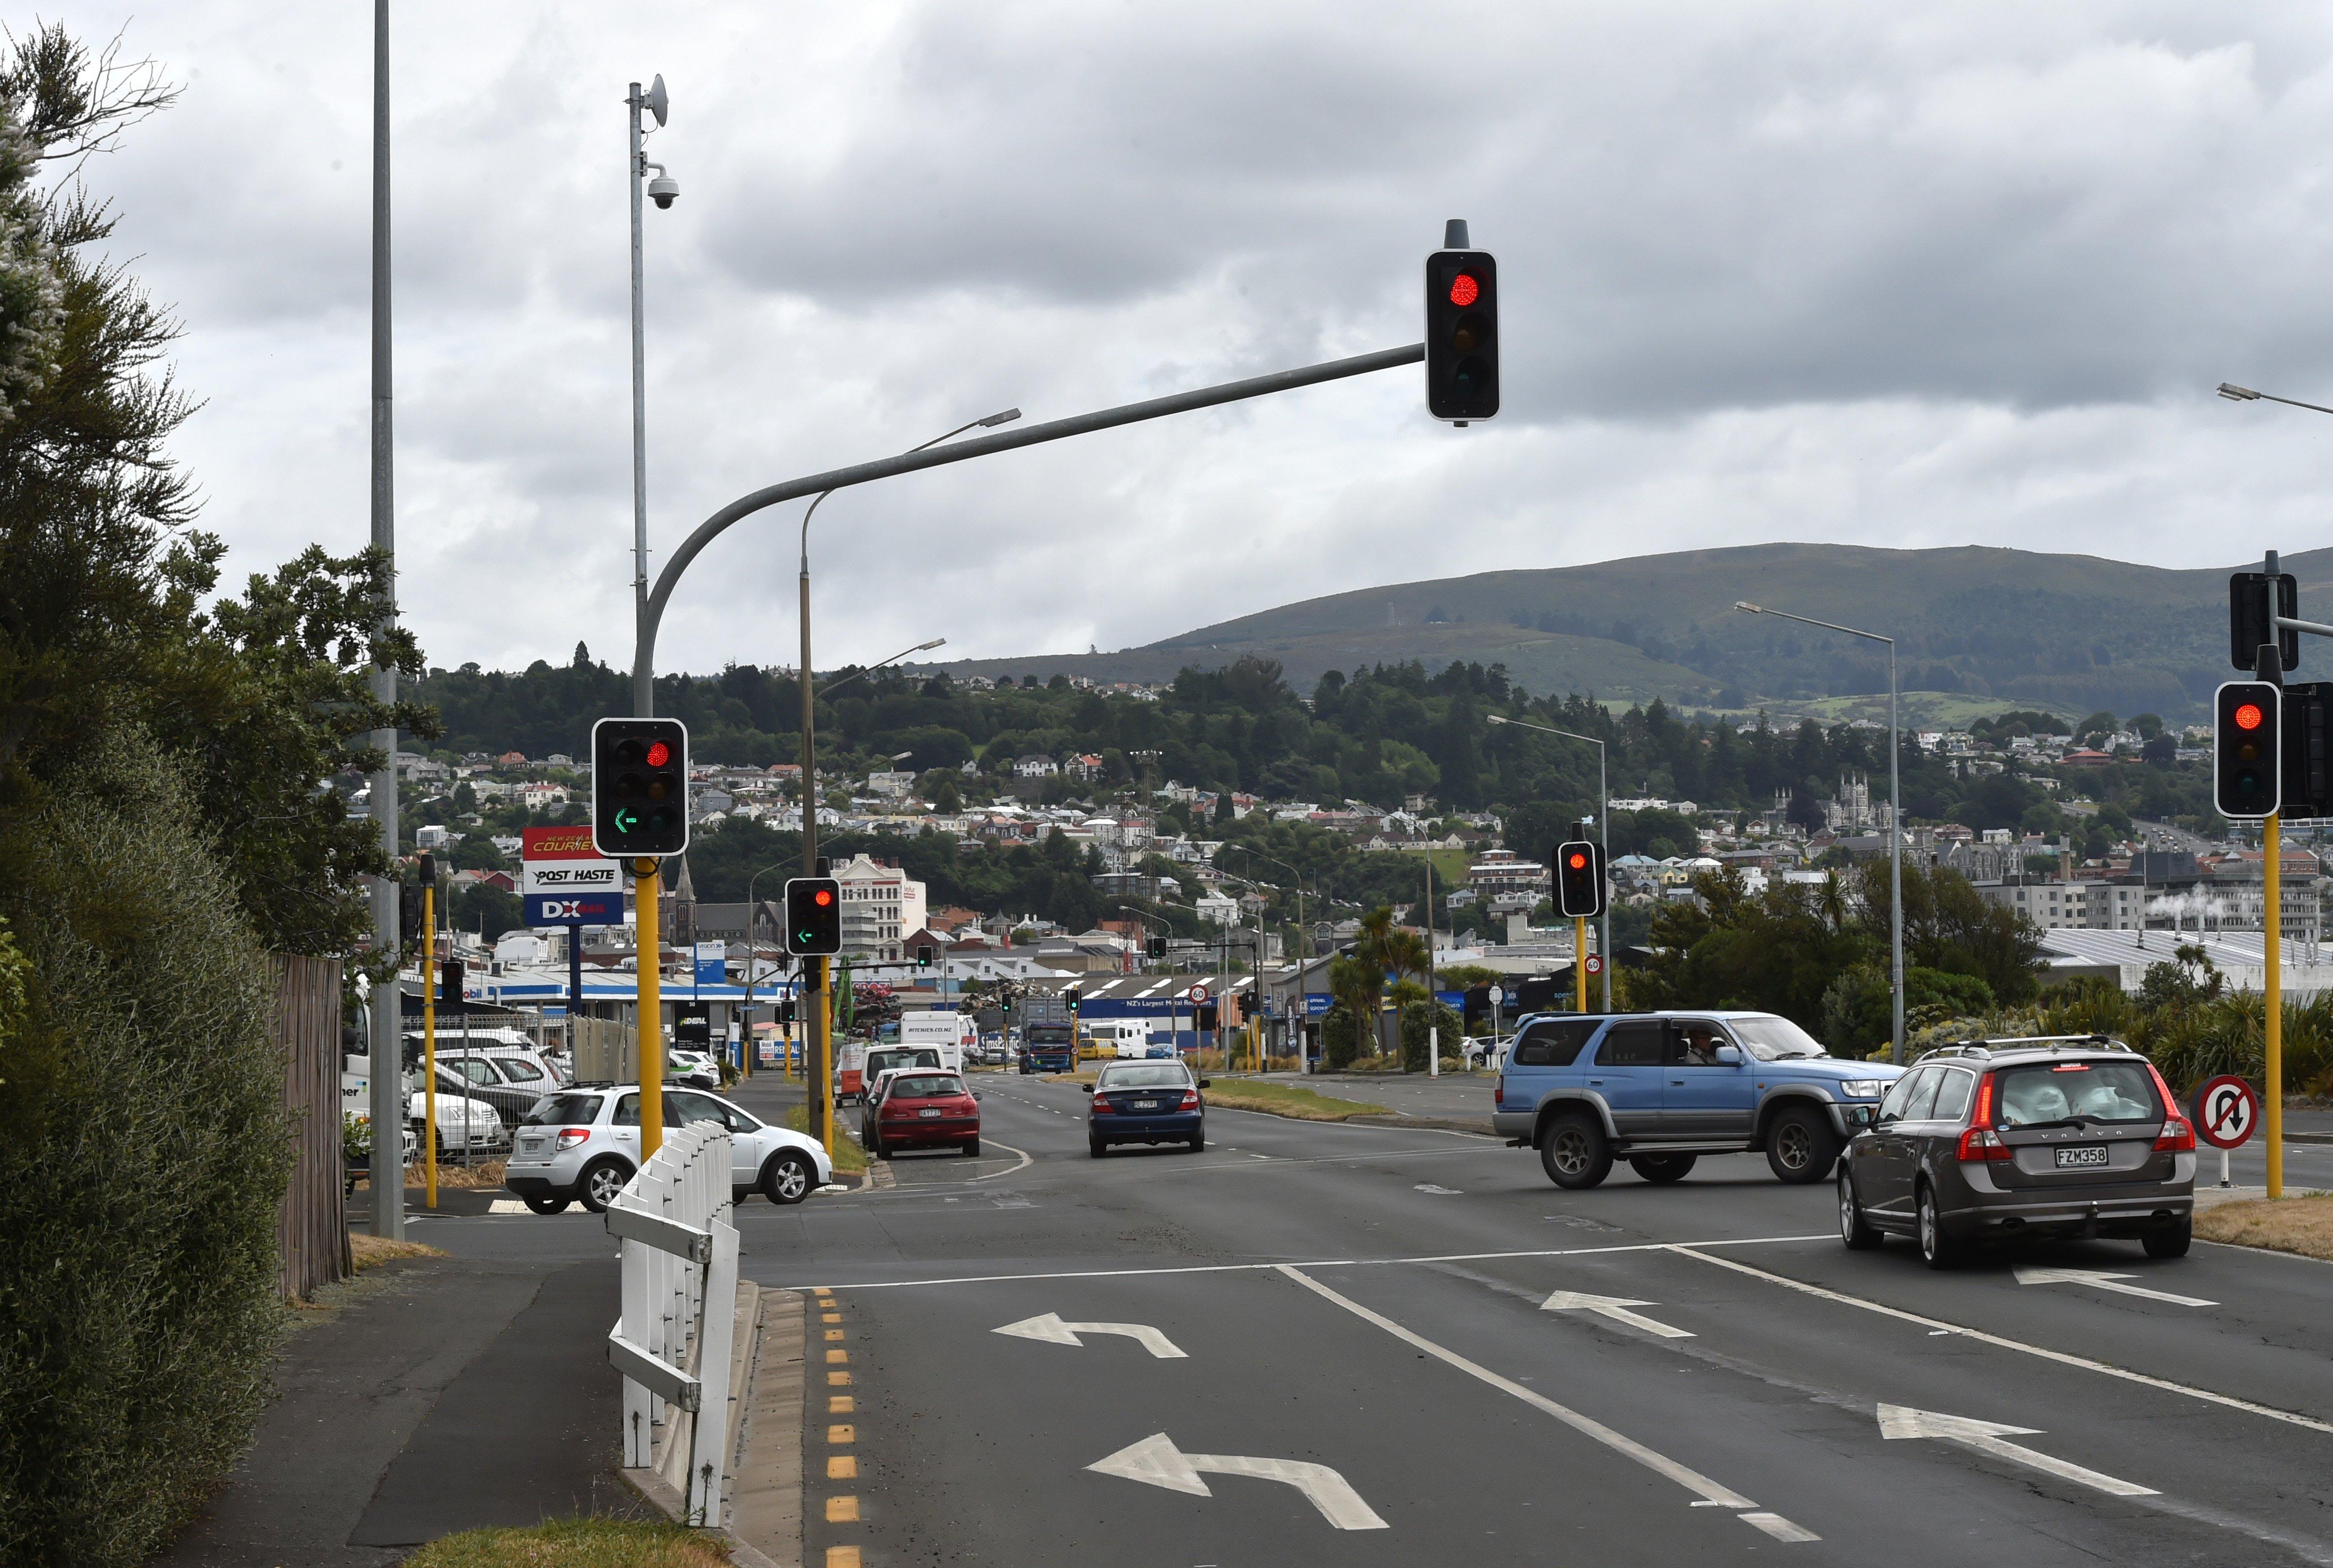 City intersection cameras setup